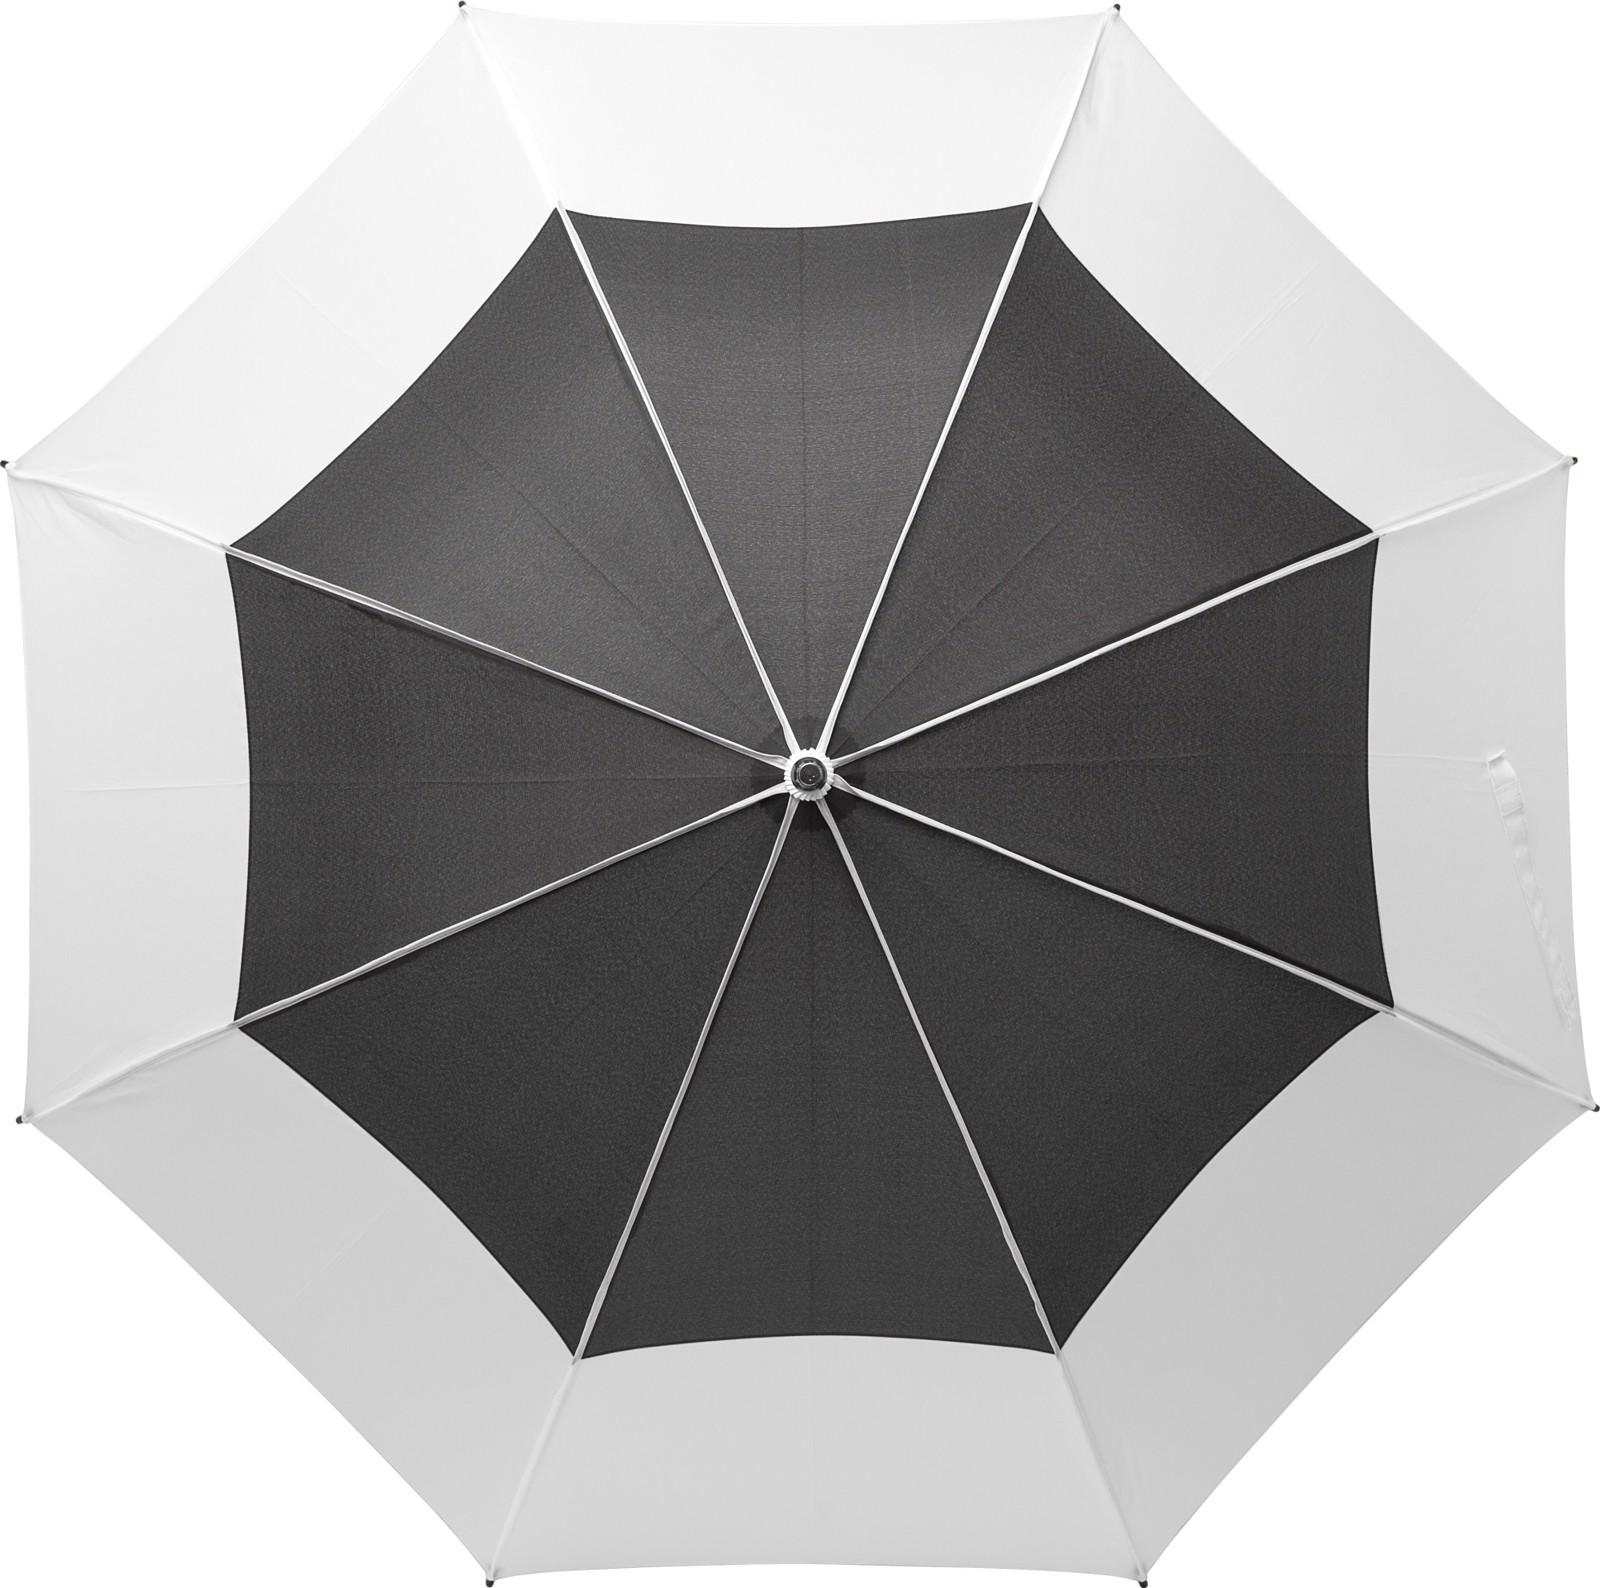 Pongee (190T) umbrella - White